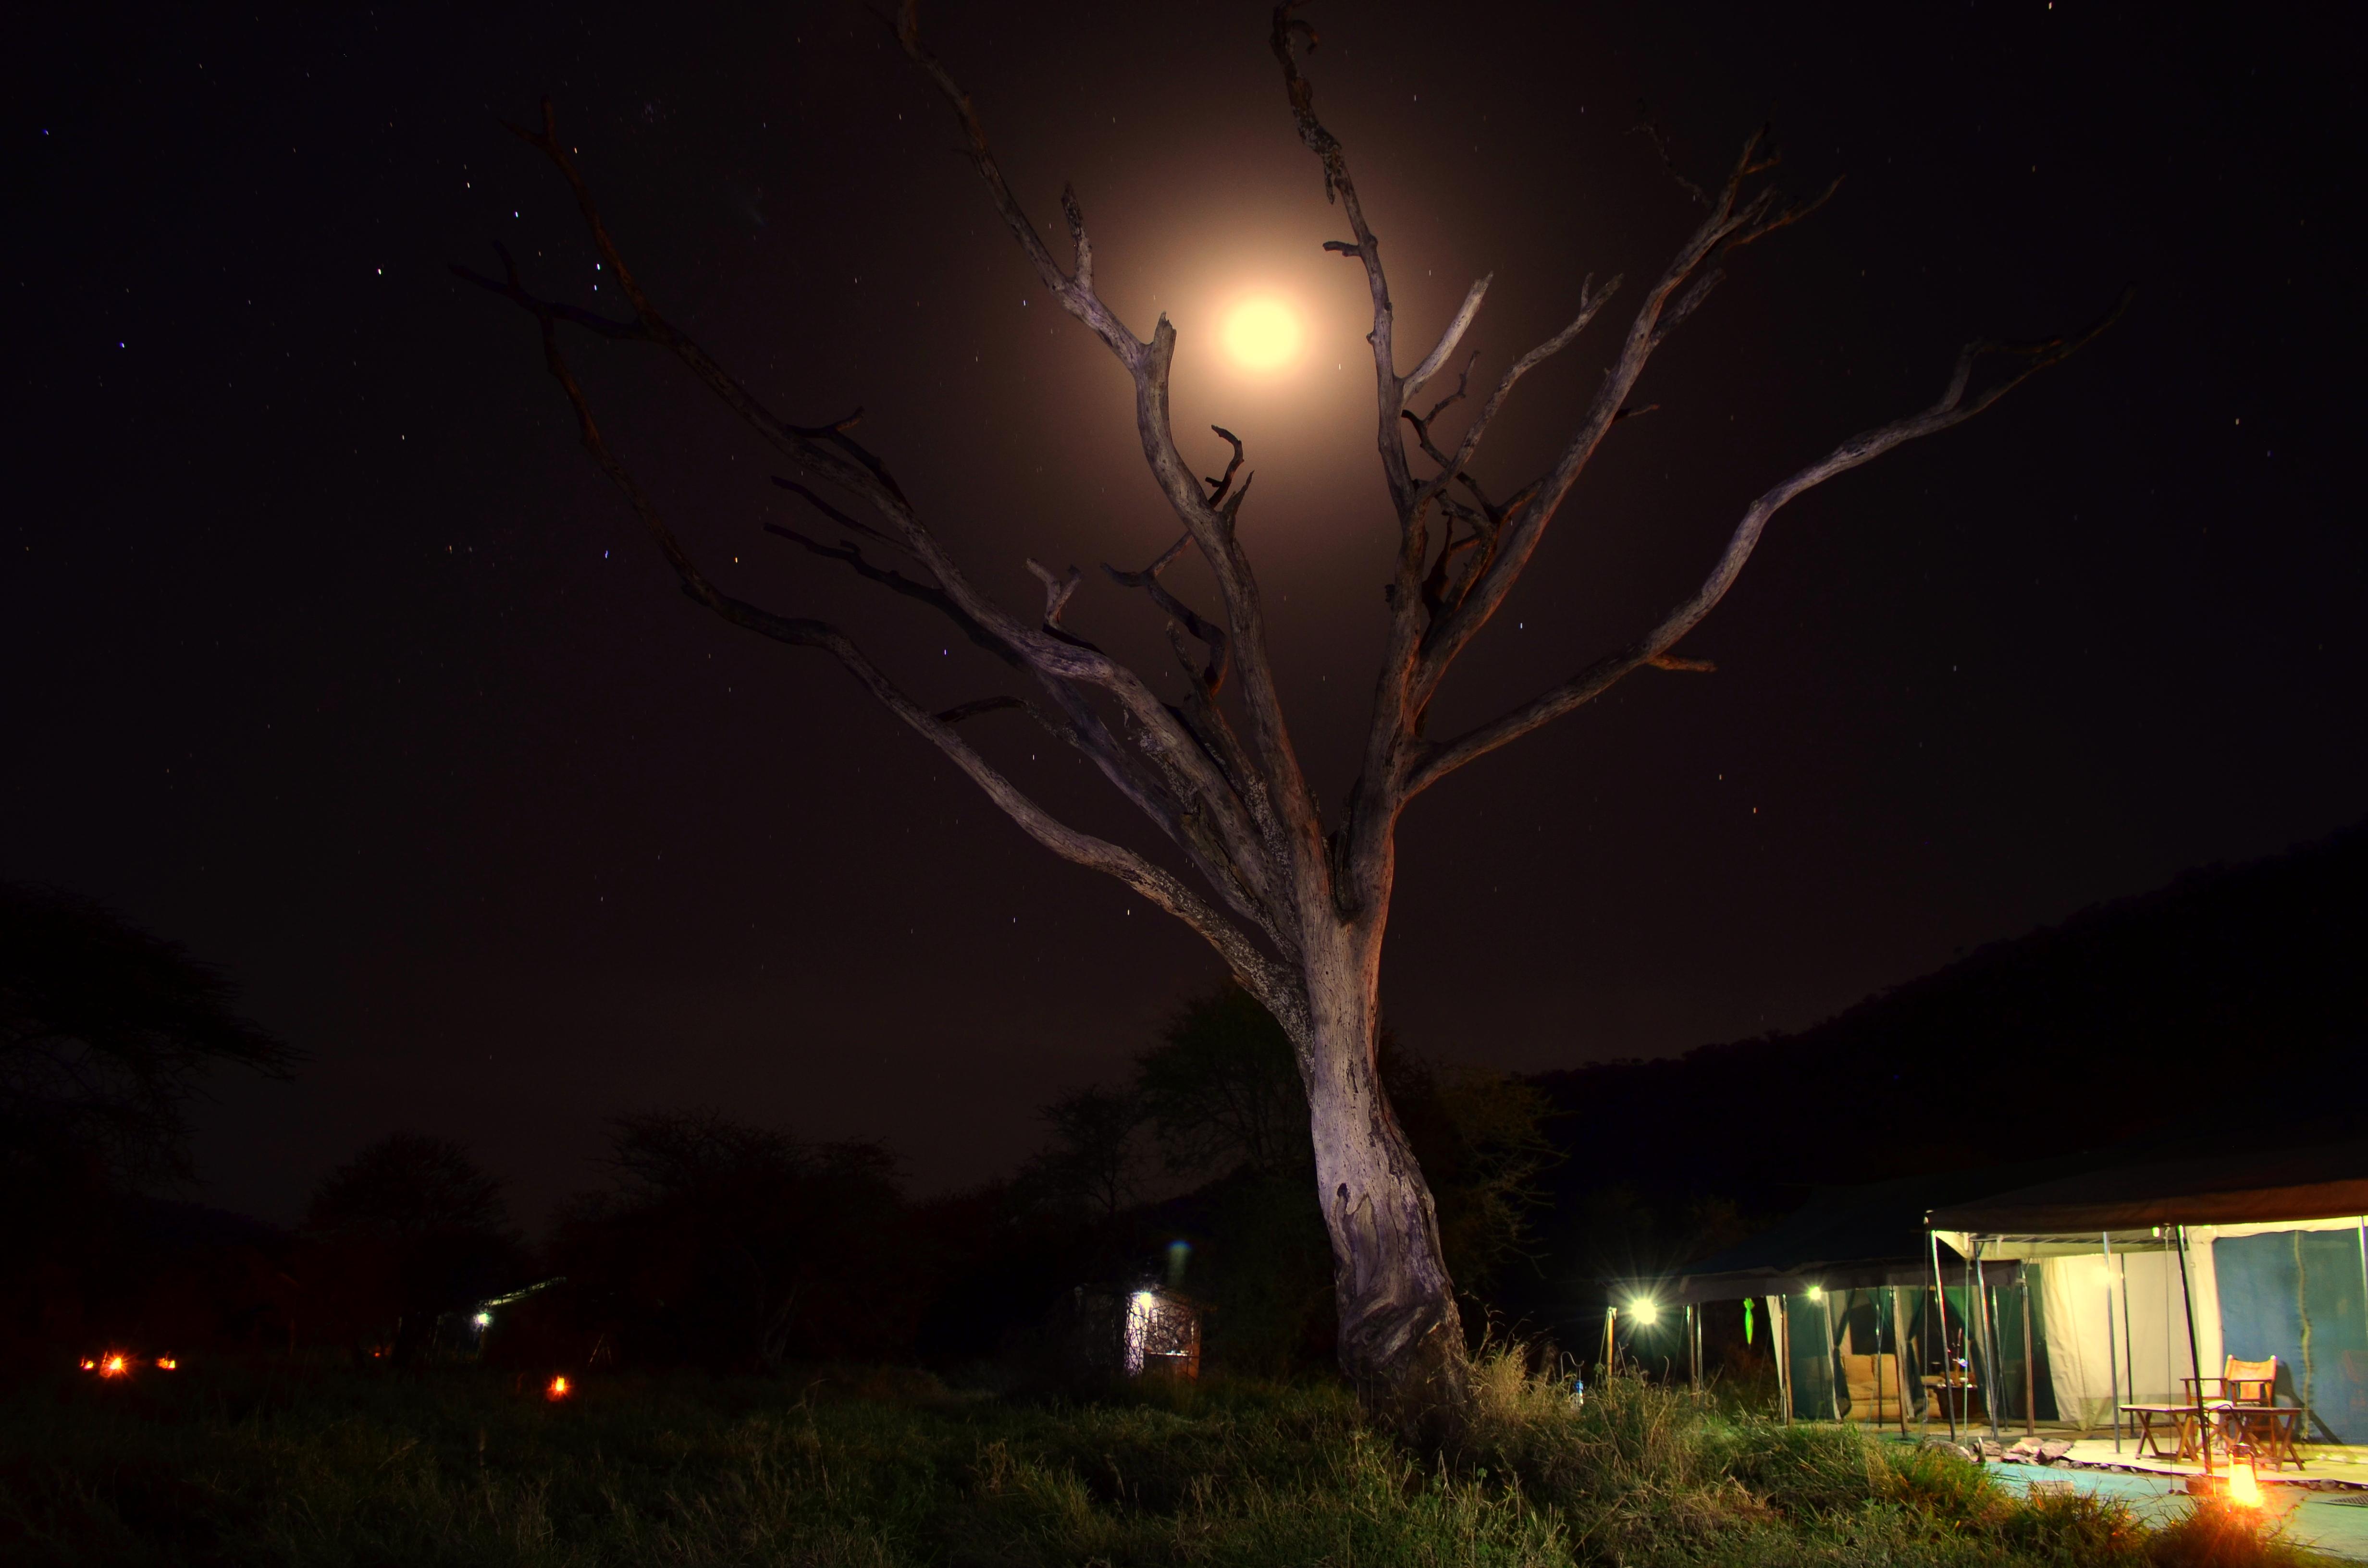 Campamento por la noche tanzania